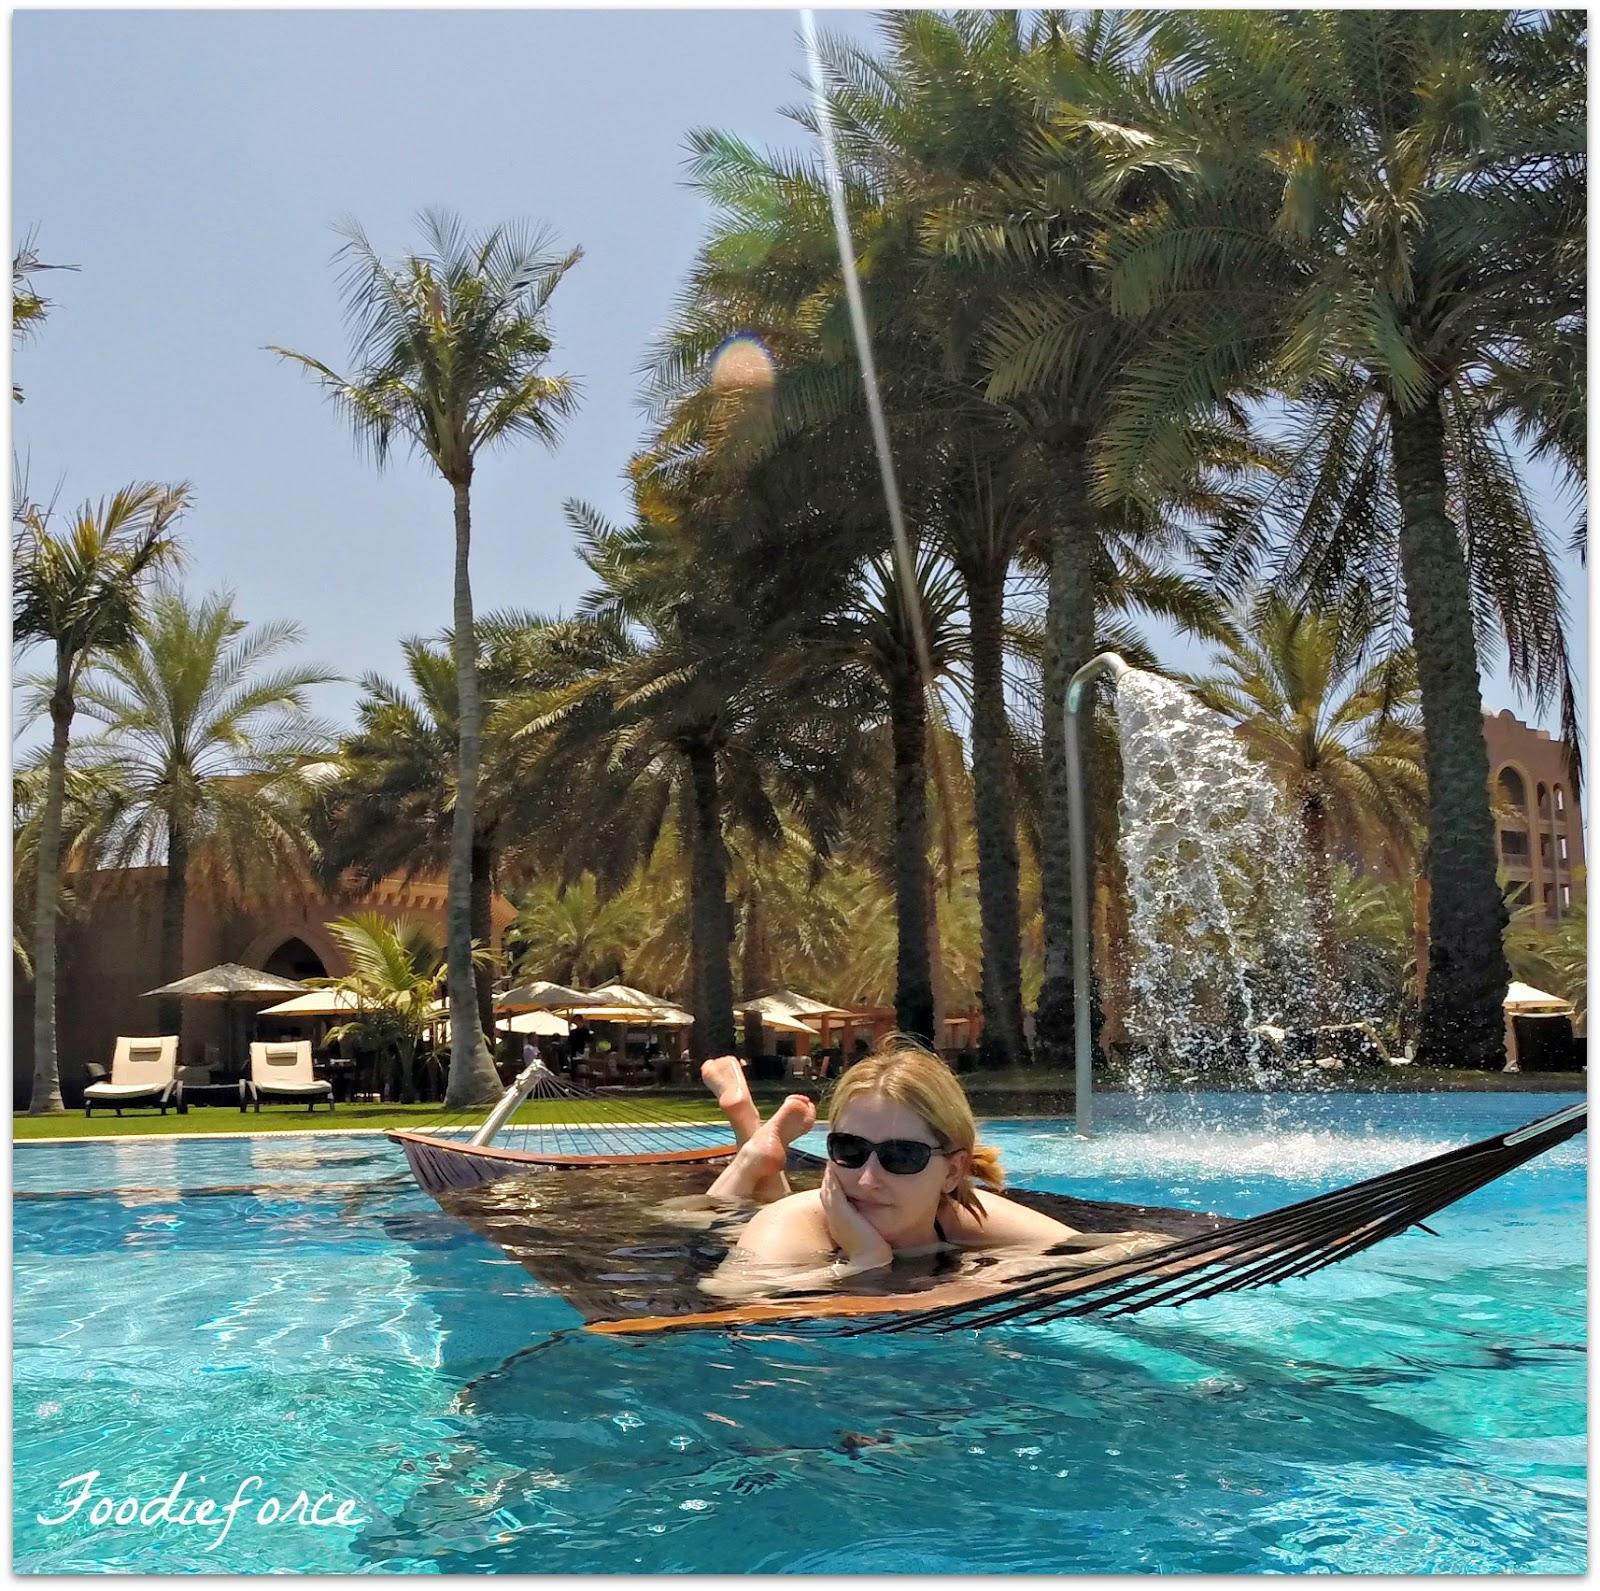 Emirate Palace swimming pool